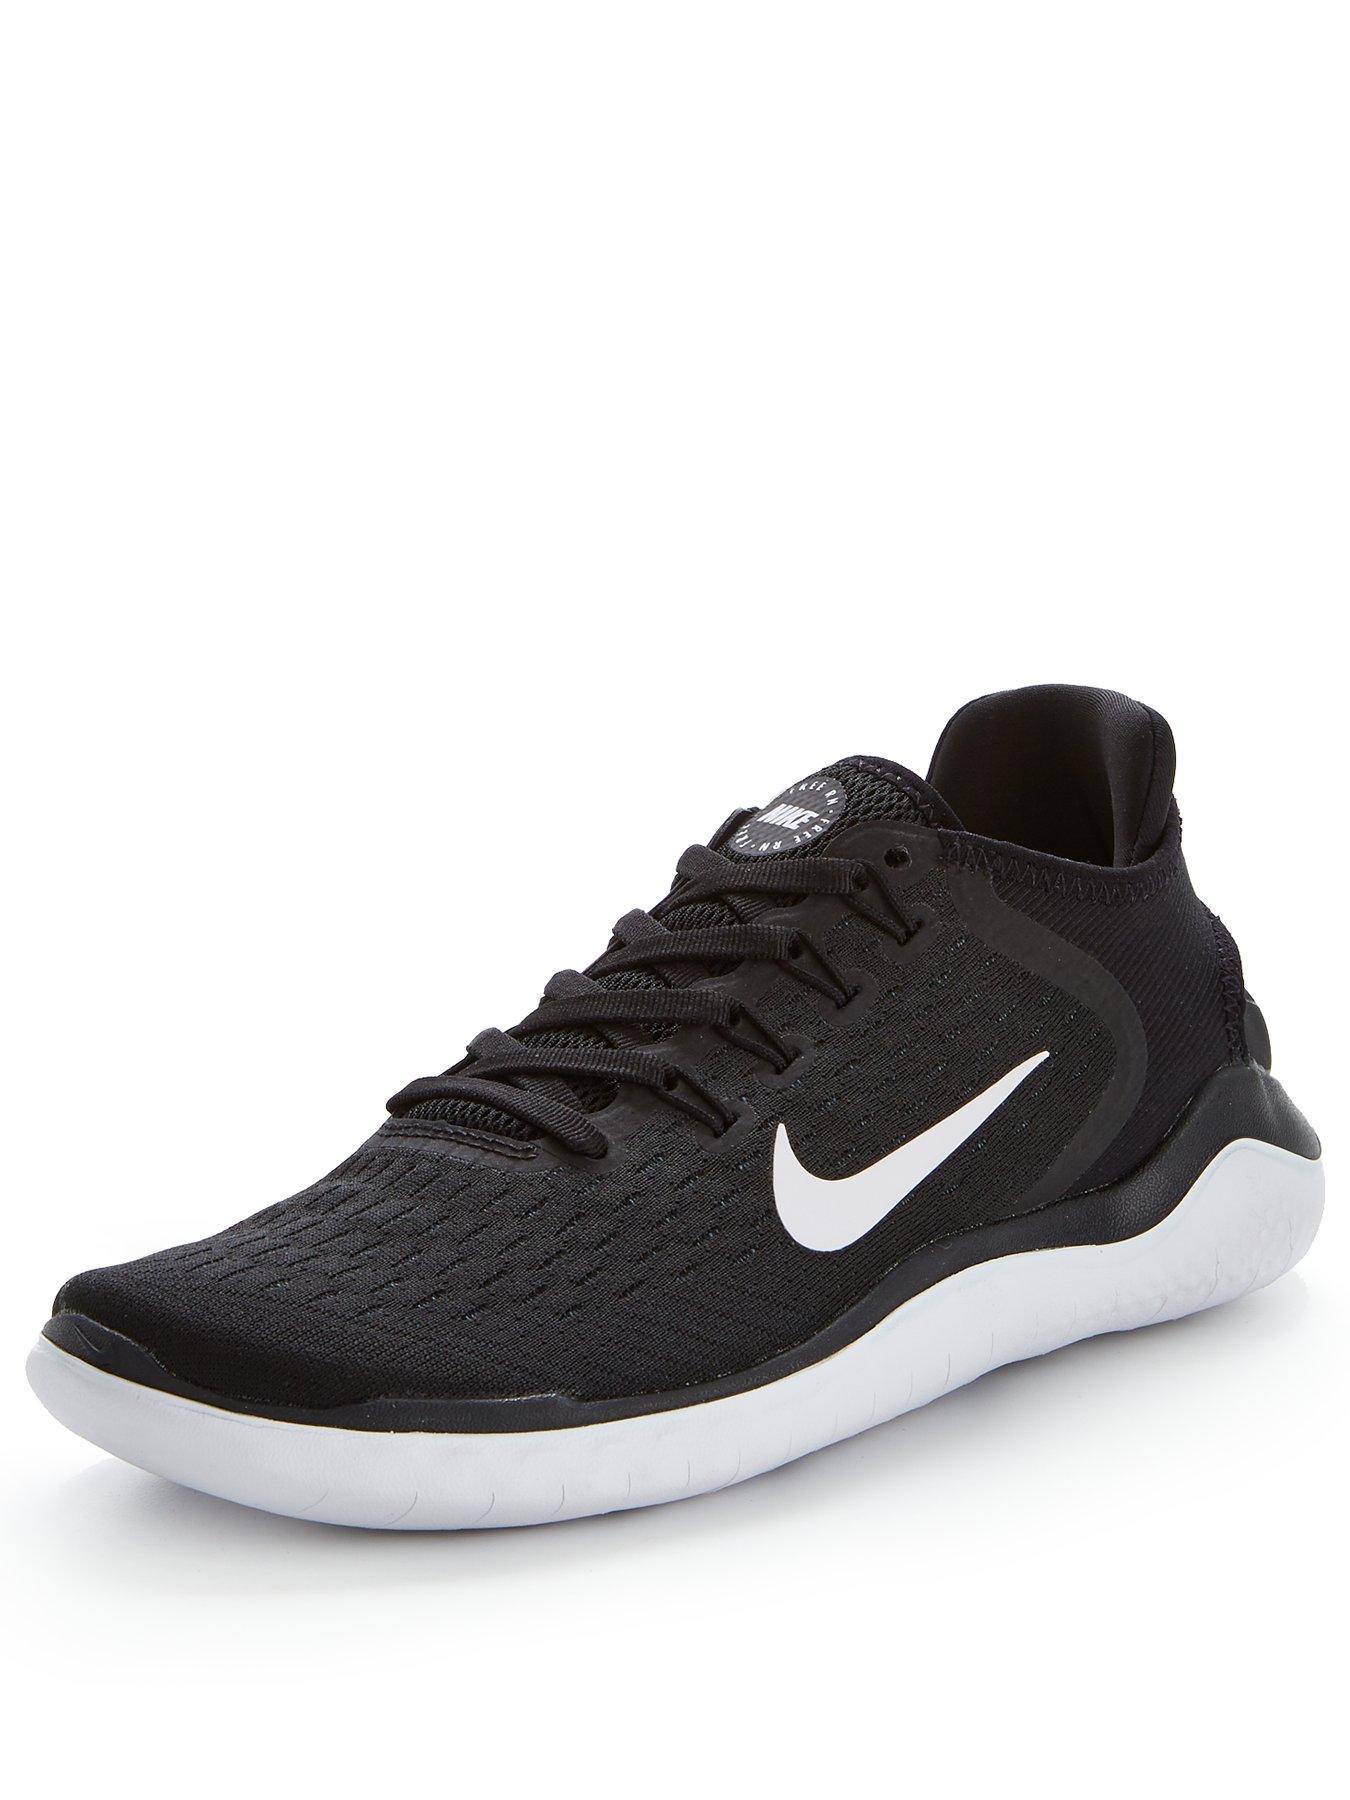 Nike Free RN 2018 - Black/White